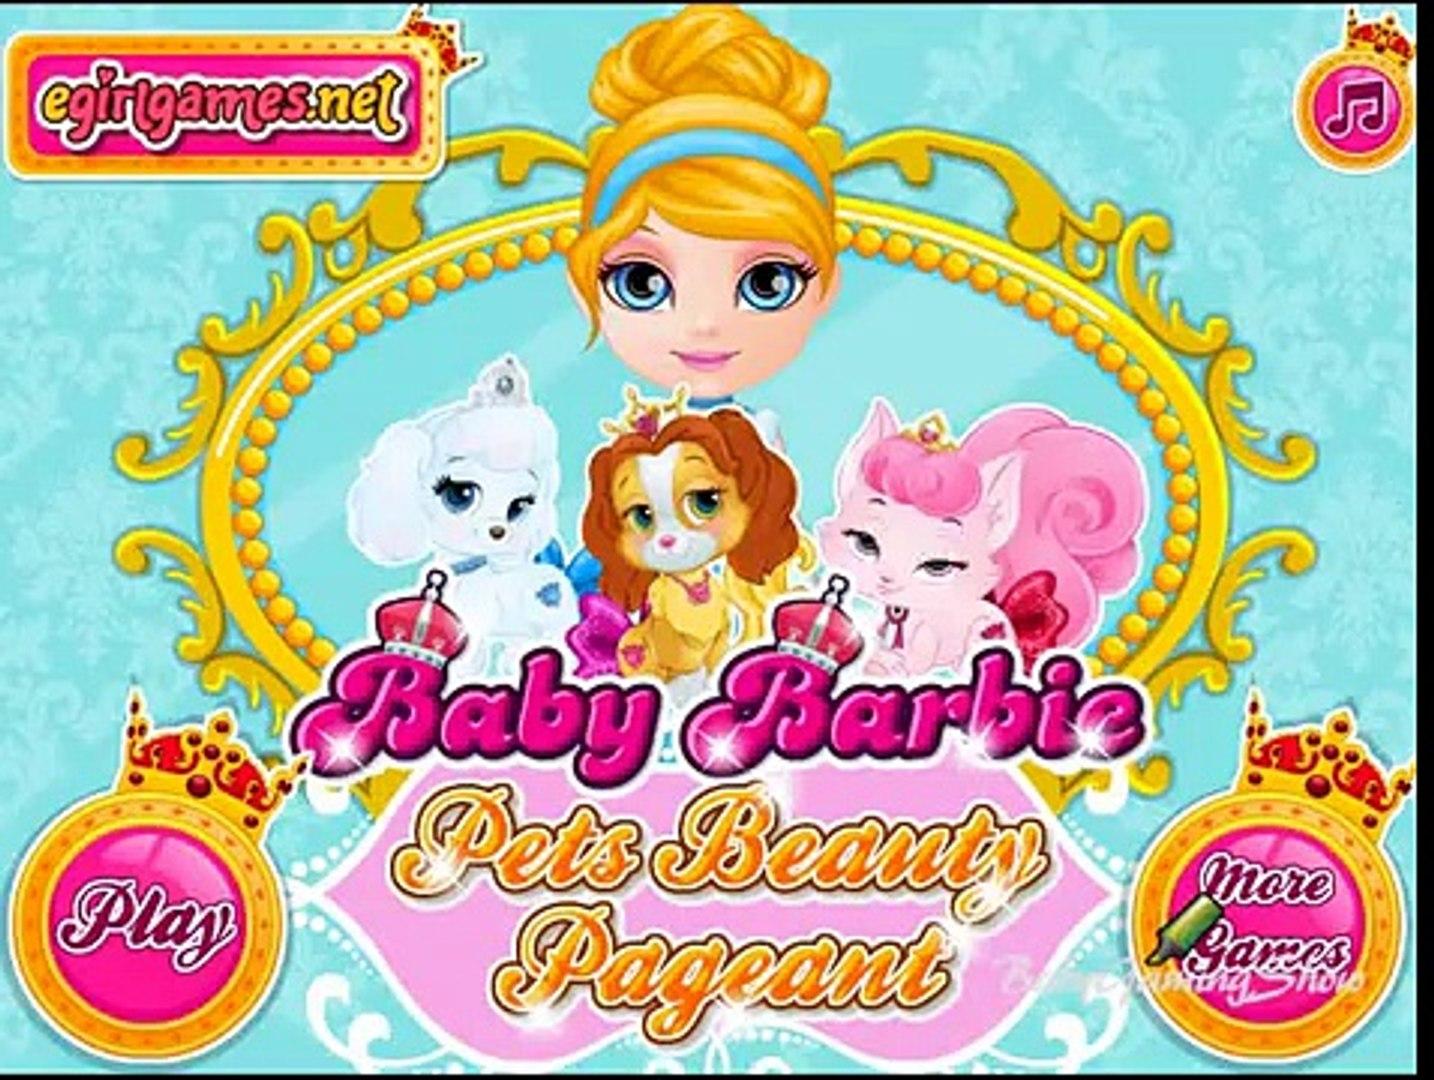 Baby Barbie Pets Beauty Pageant Princess Belle Palace Pet Teacup Puppy Care